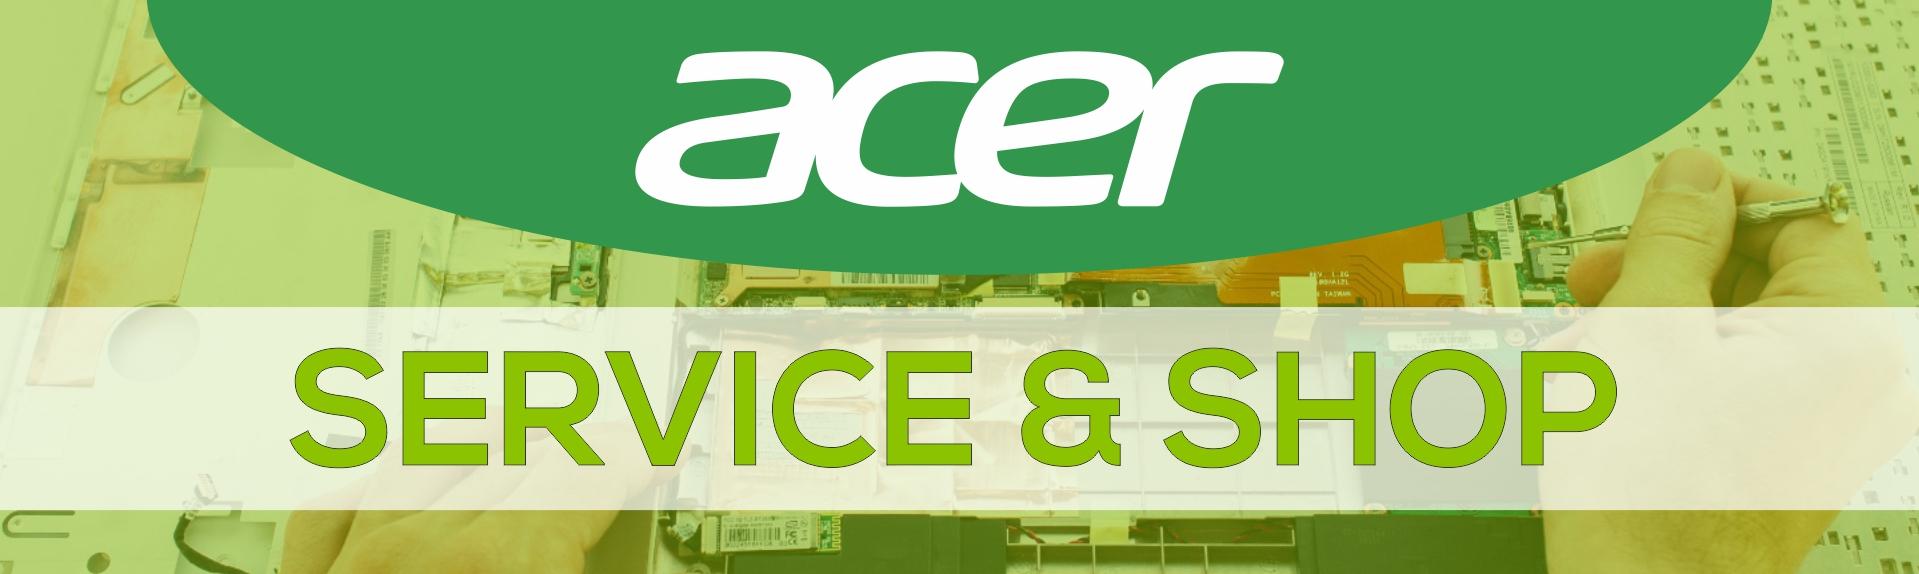 service laptop acer